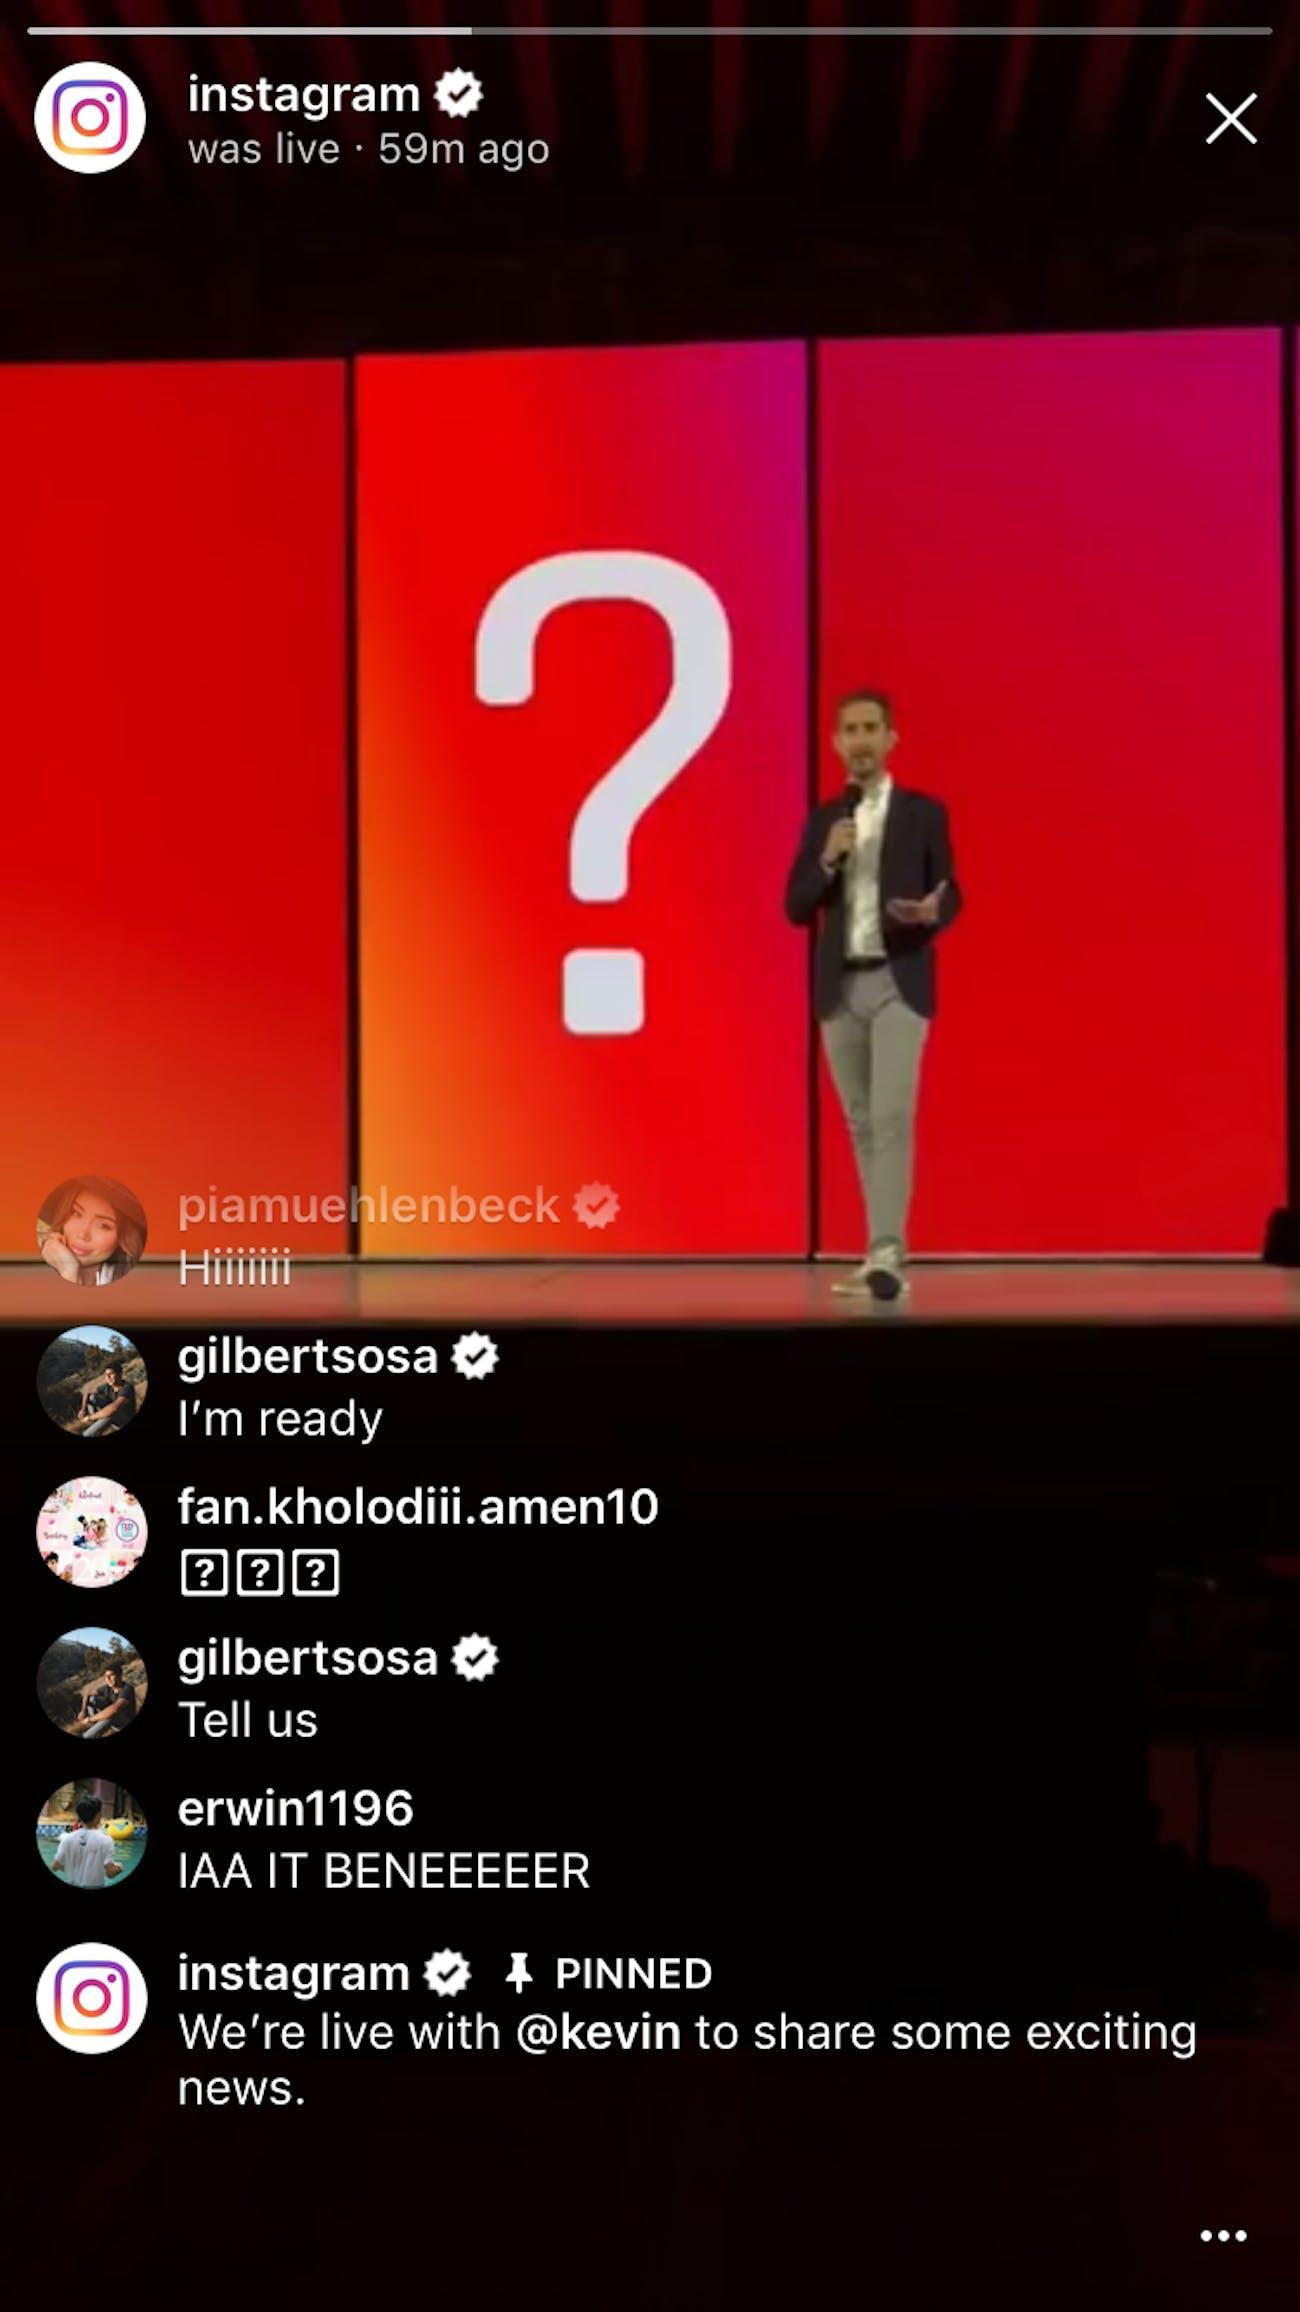 IGTV announcement